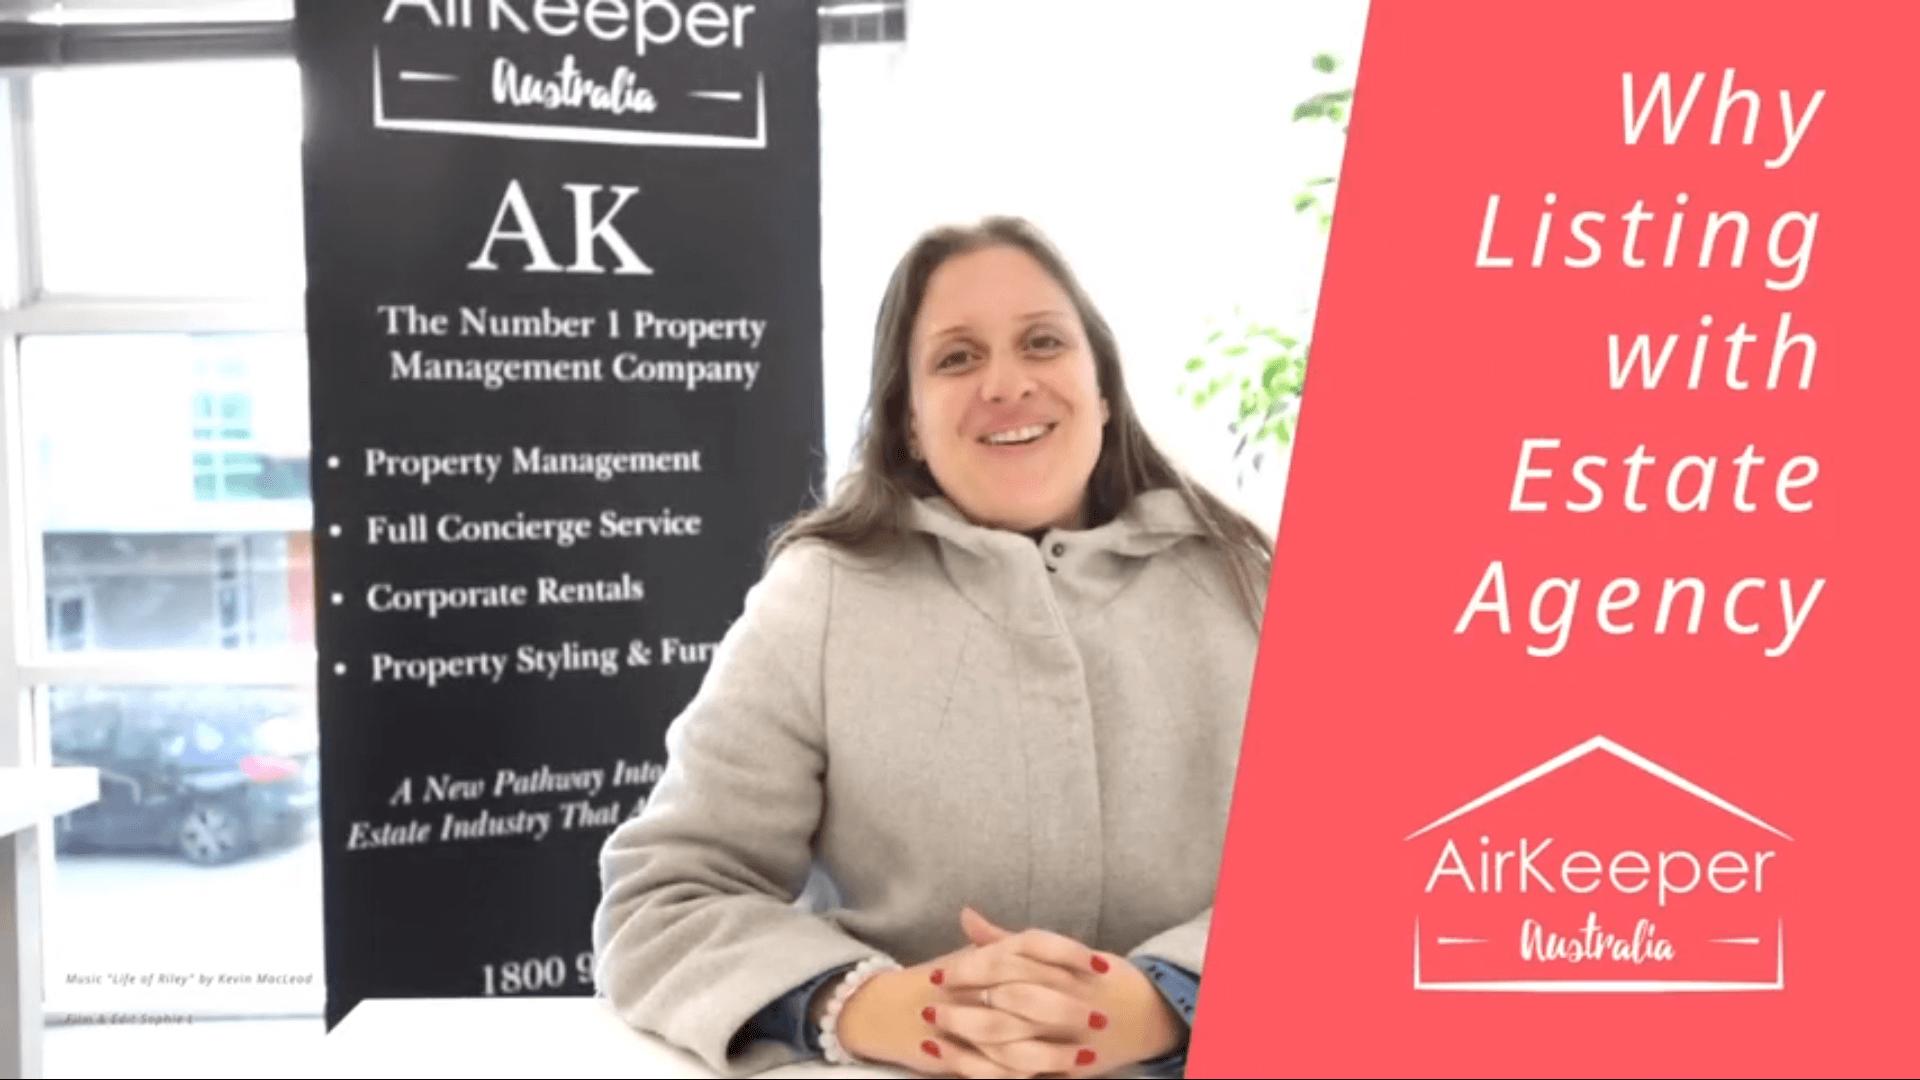 Client - Airbnb Property Management -Airkeeper AU - airbnb in sydney - Airbnb Property Management -Airkeeper AU